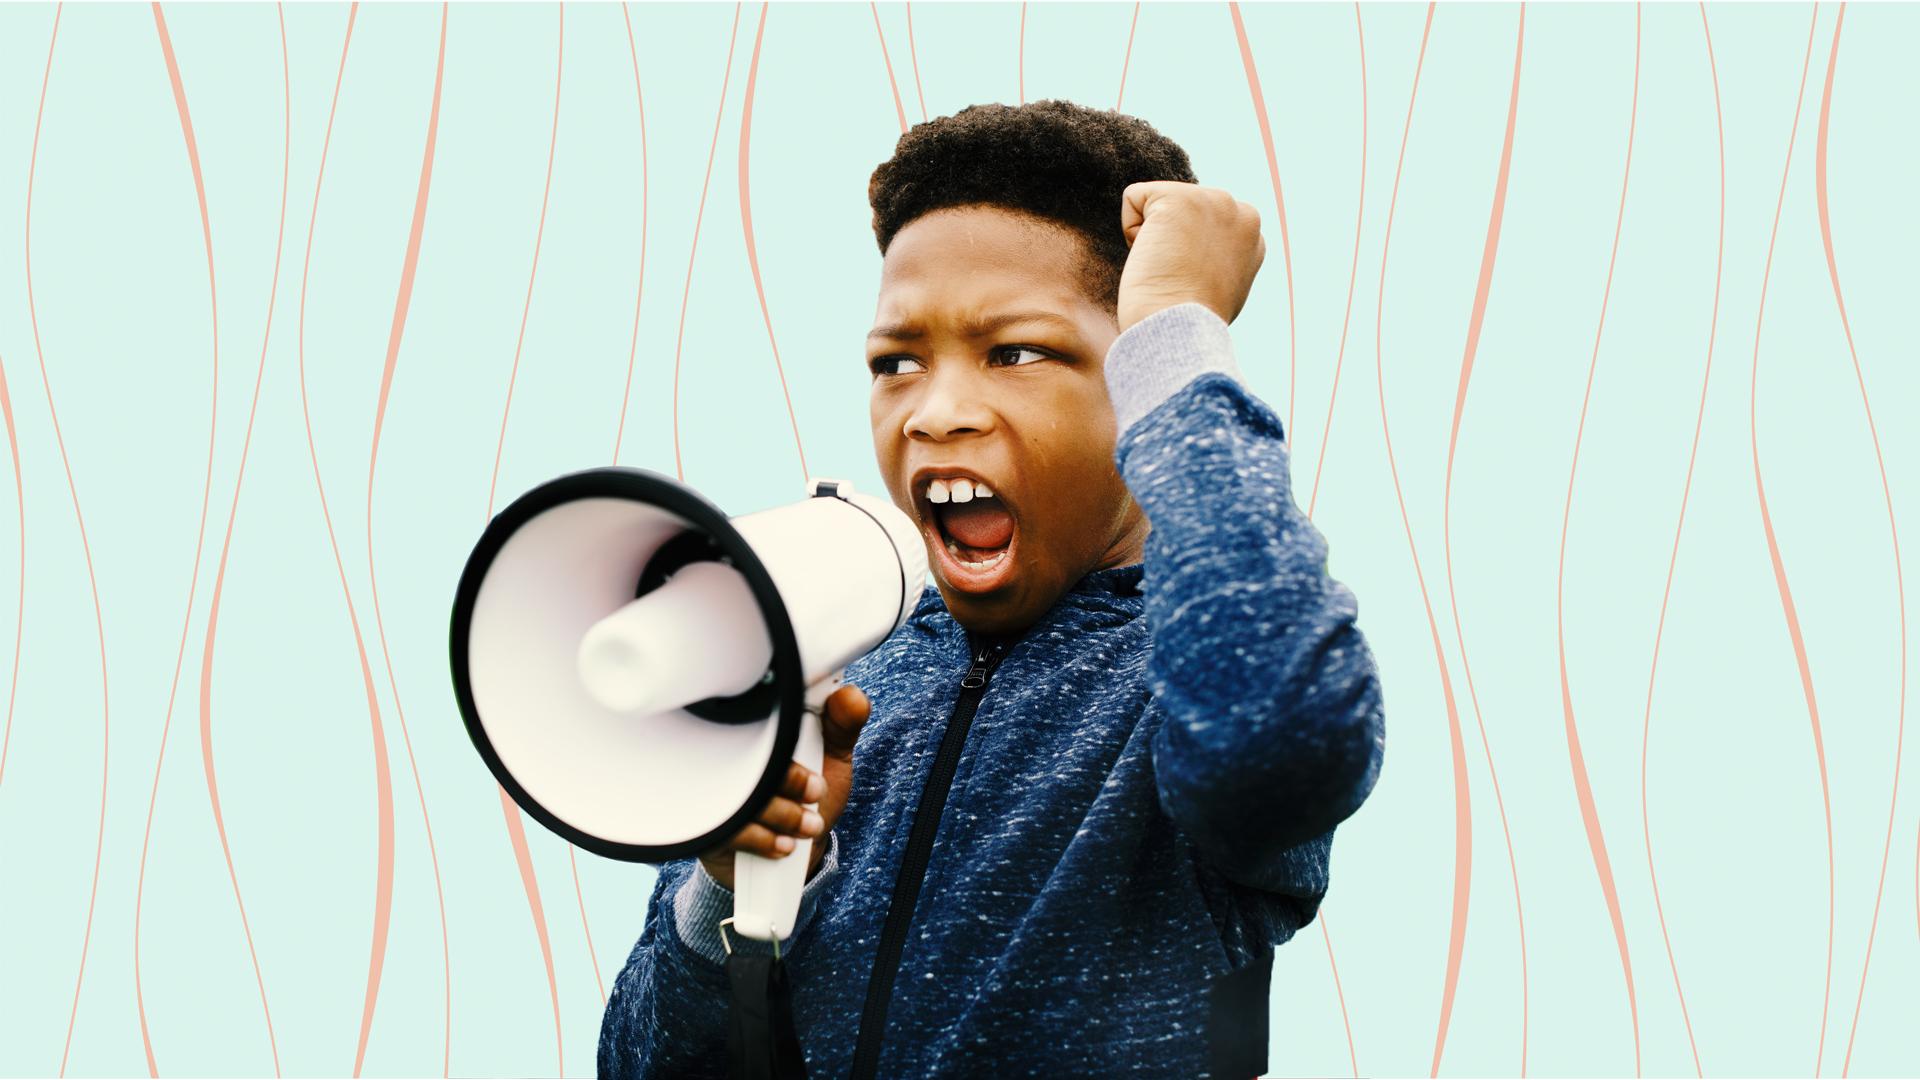 How to Raise an Activist Kid